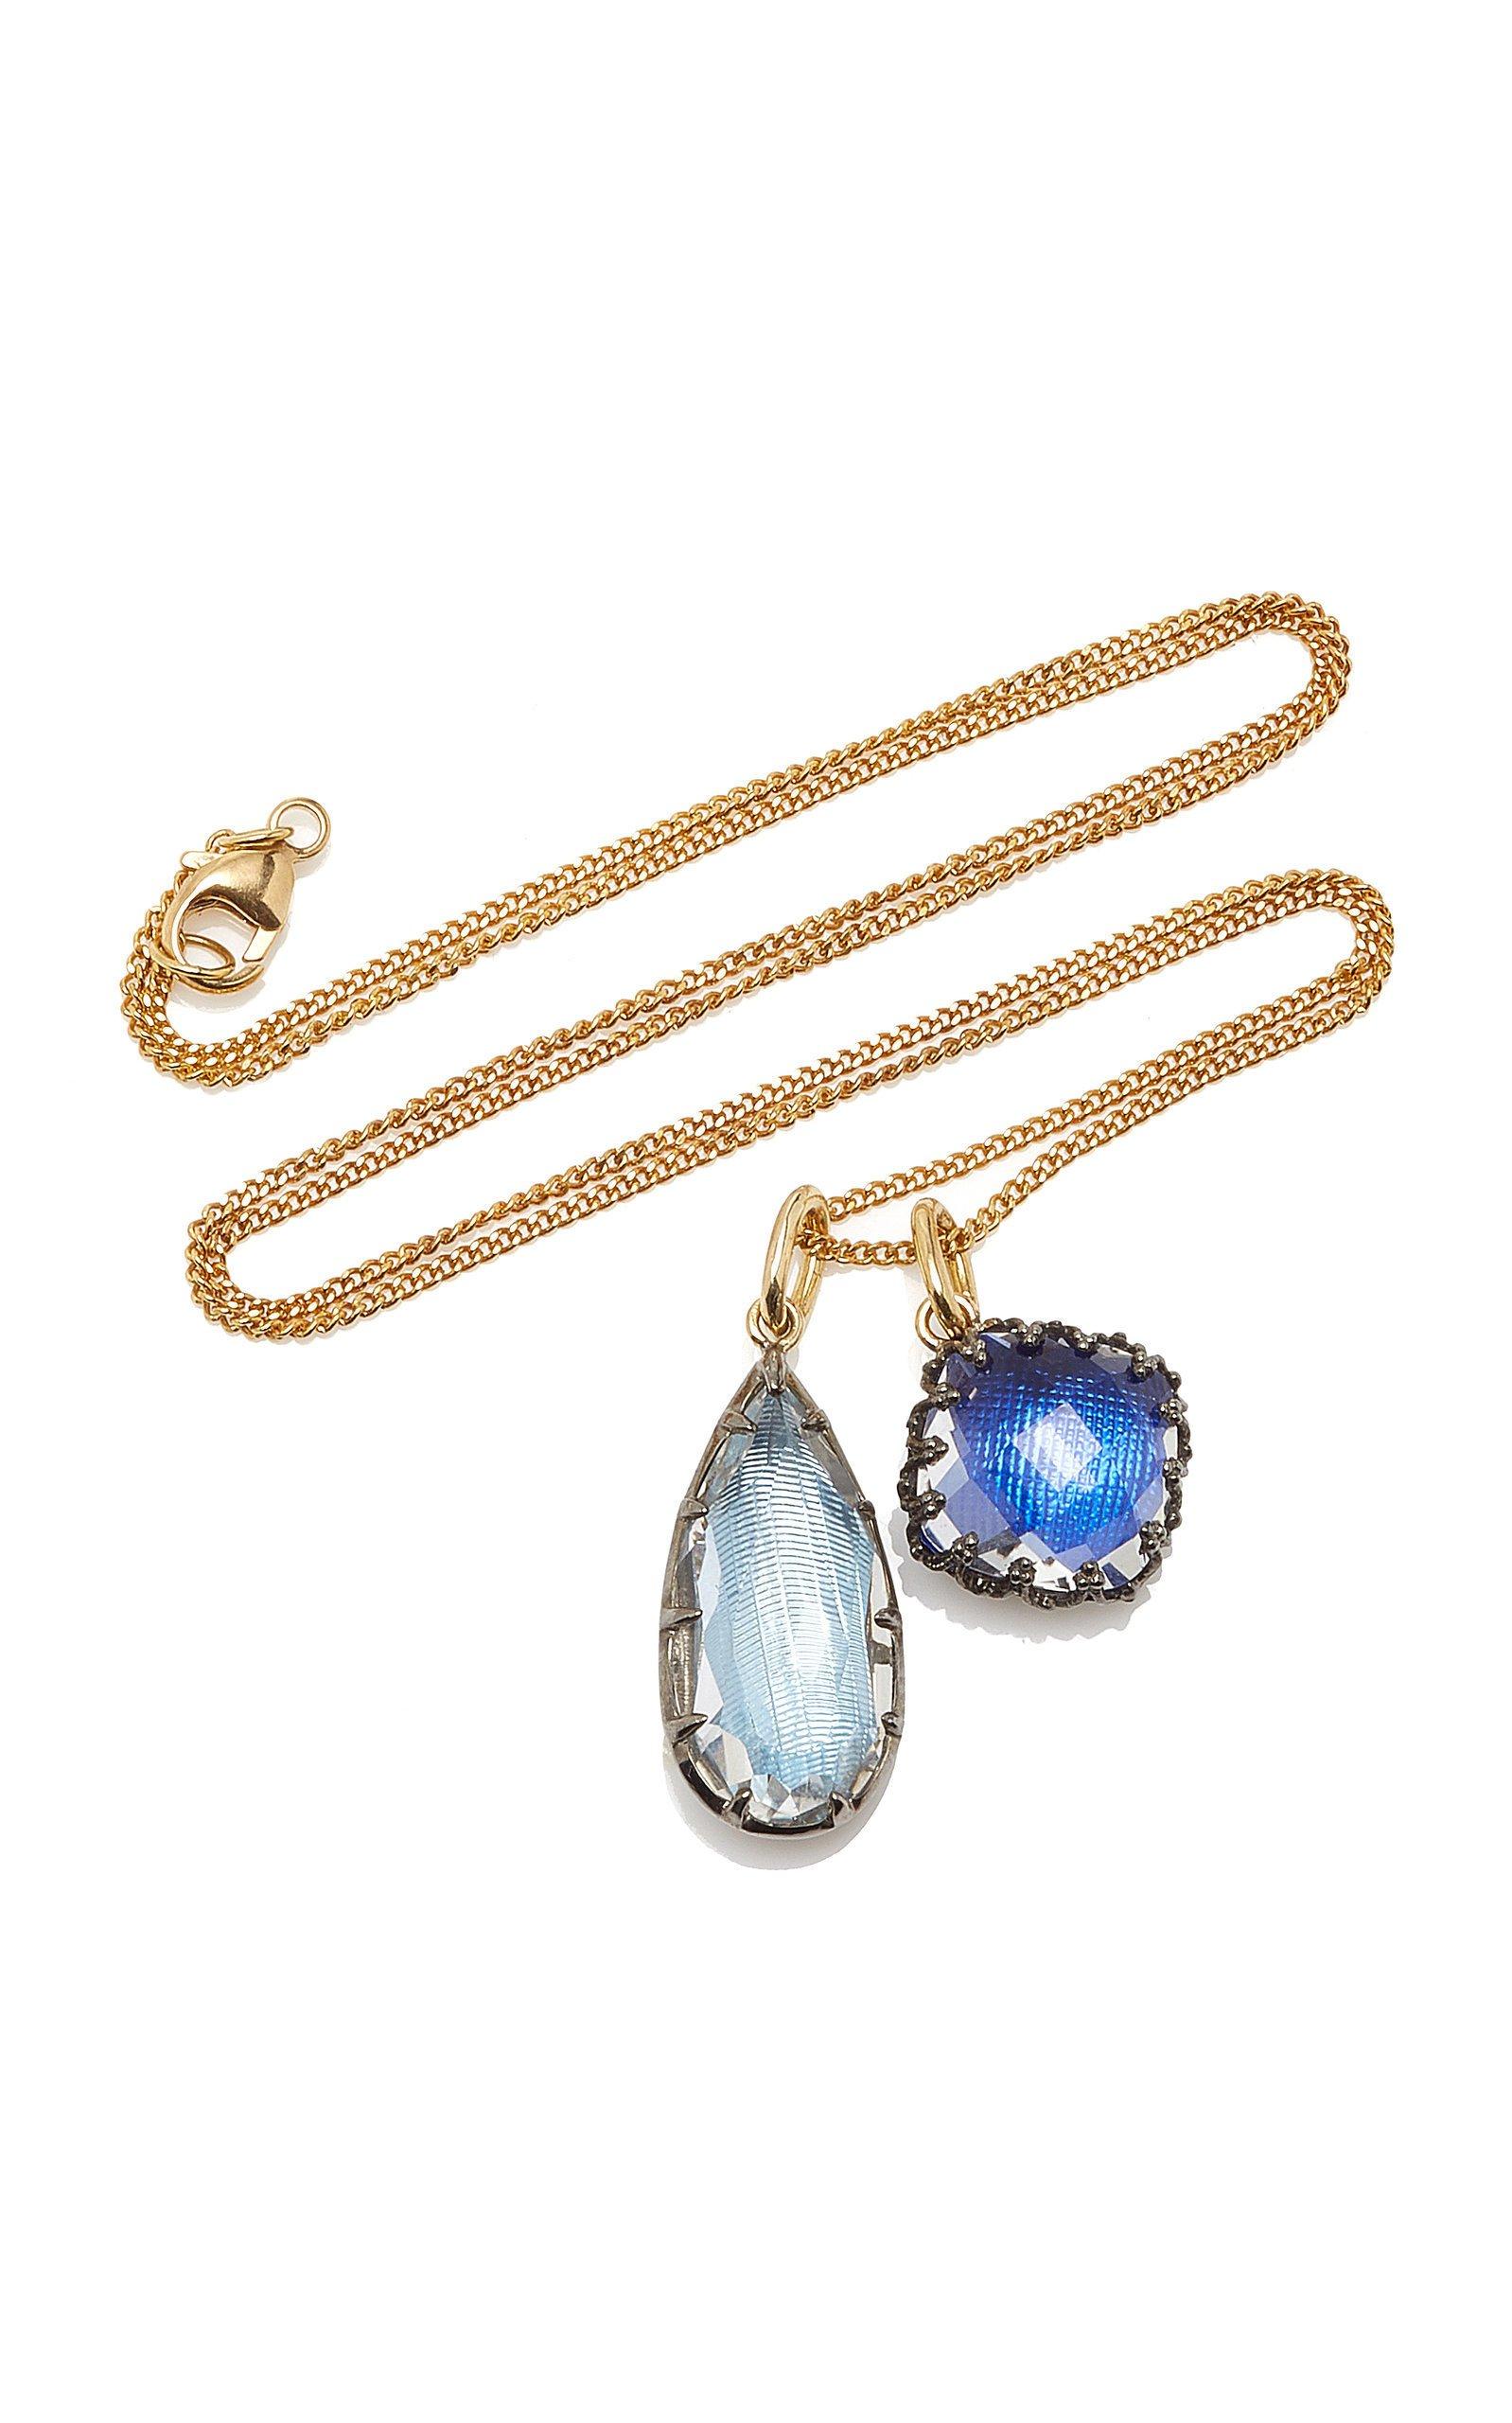 Larkspur & Hawk Lady Emily 14K Gold Black Rhodium Sterling Silver And Quartz Necklace